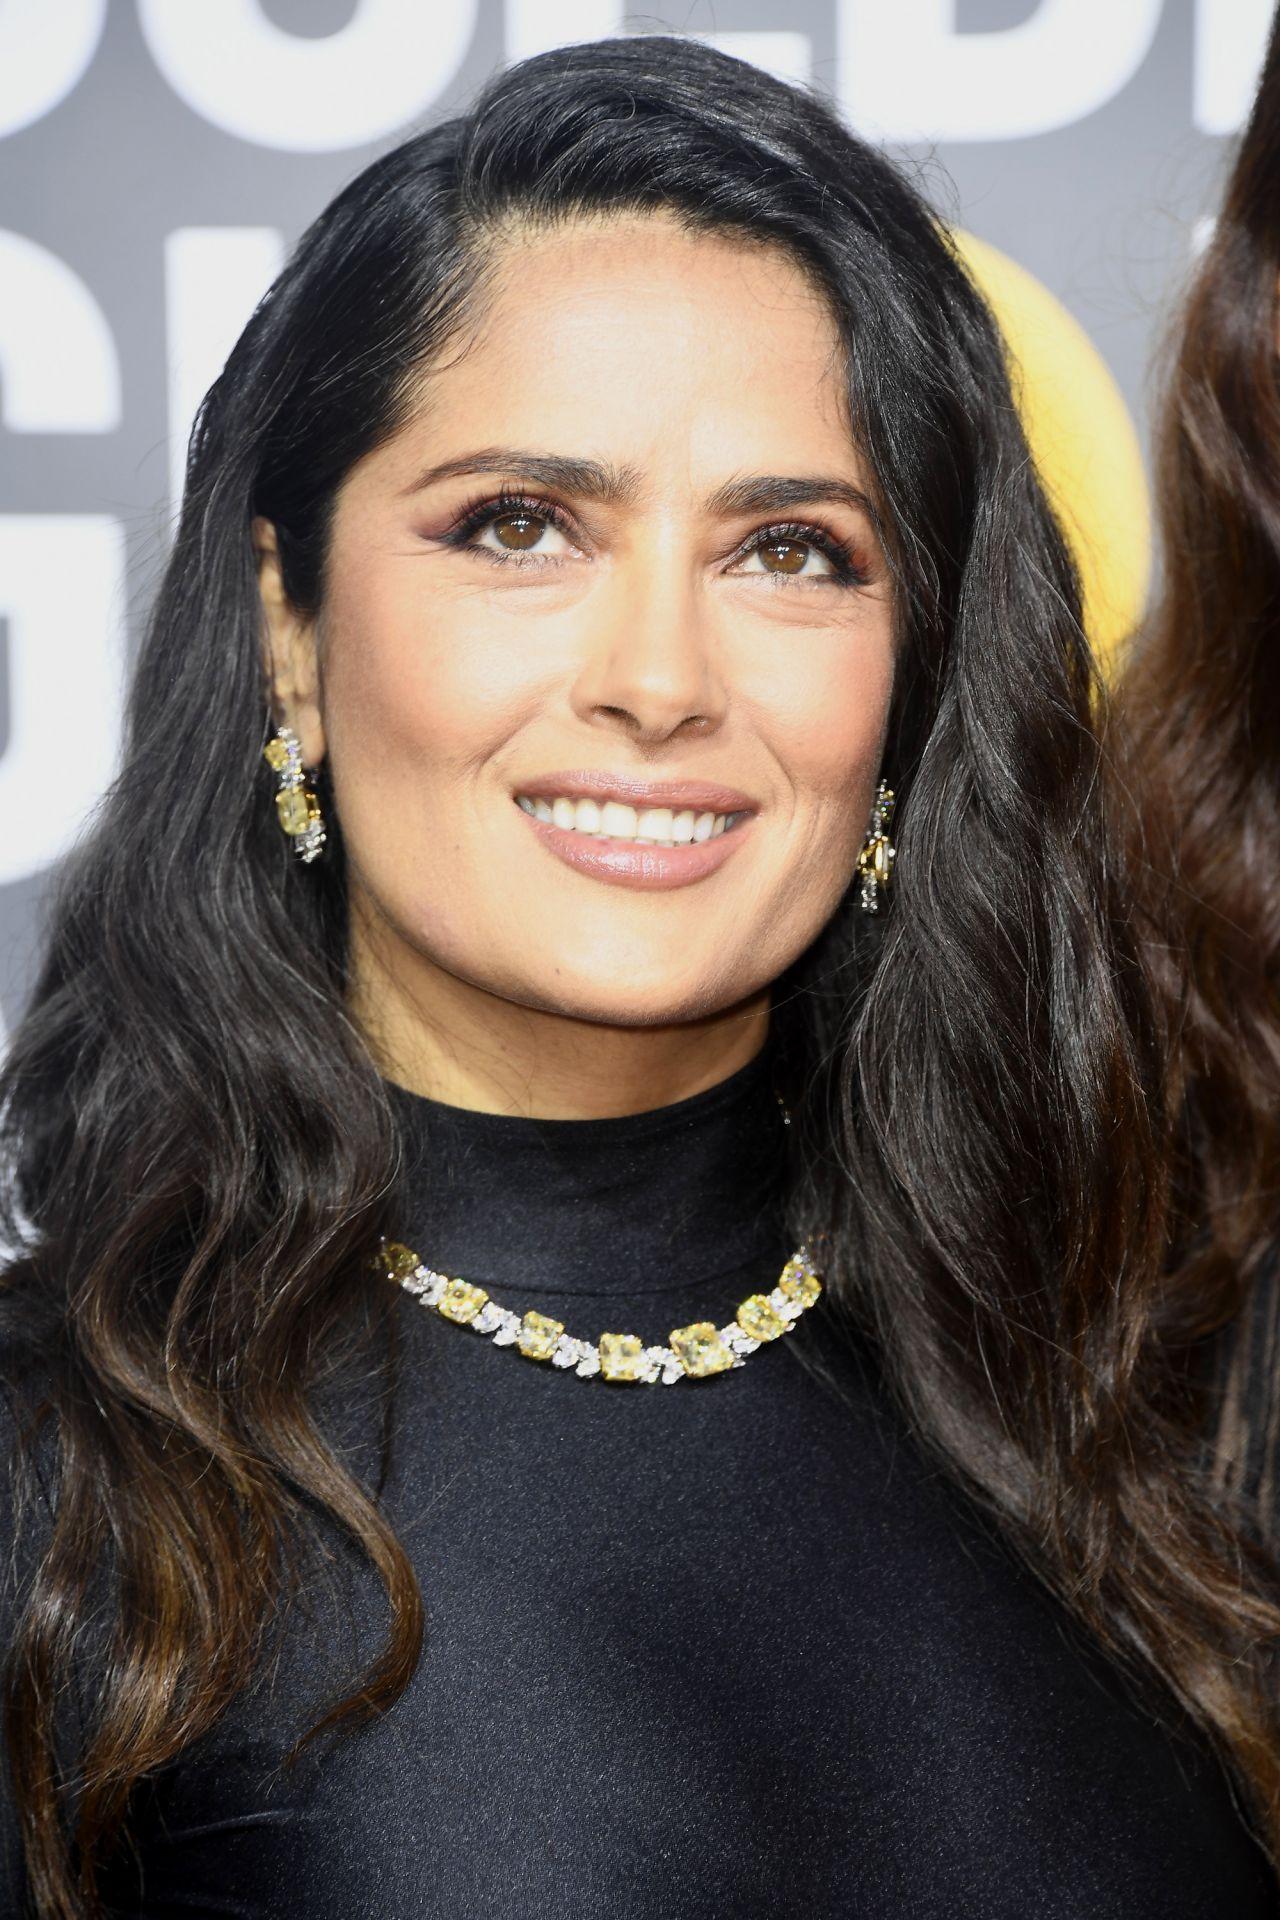 http://celebmafia.com/wp-content/uploads/2018/01/salma-hayek-golden-globe-awards-2018-1.jpg